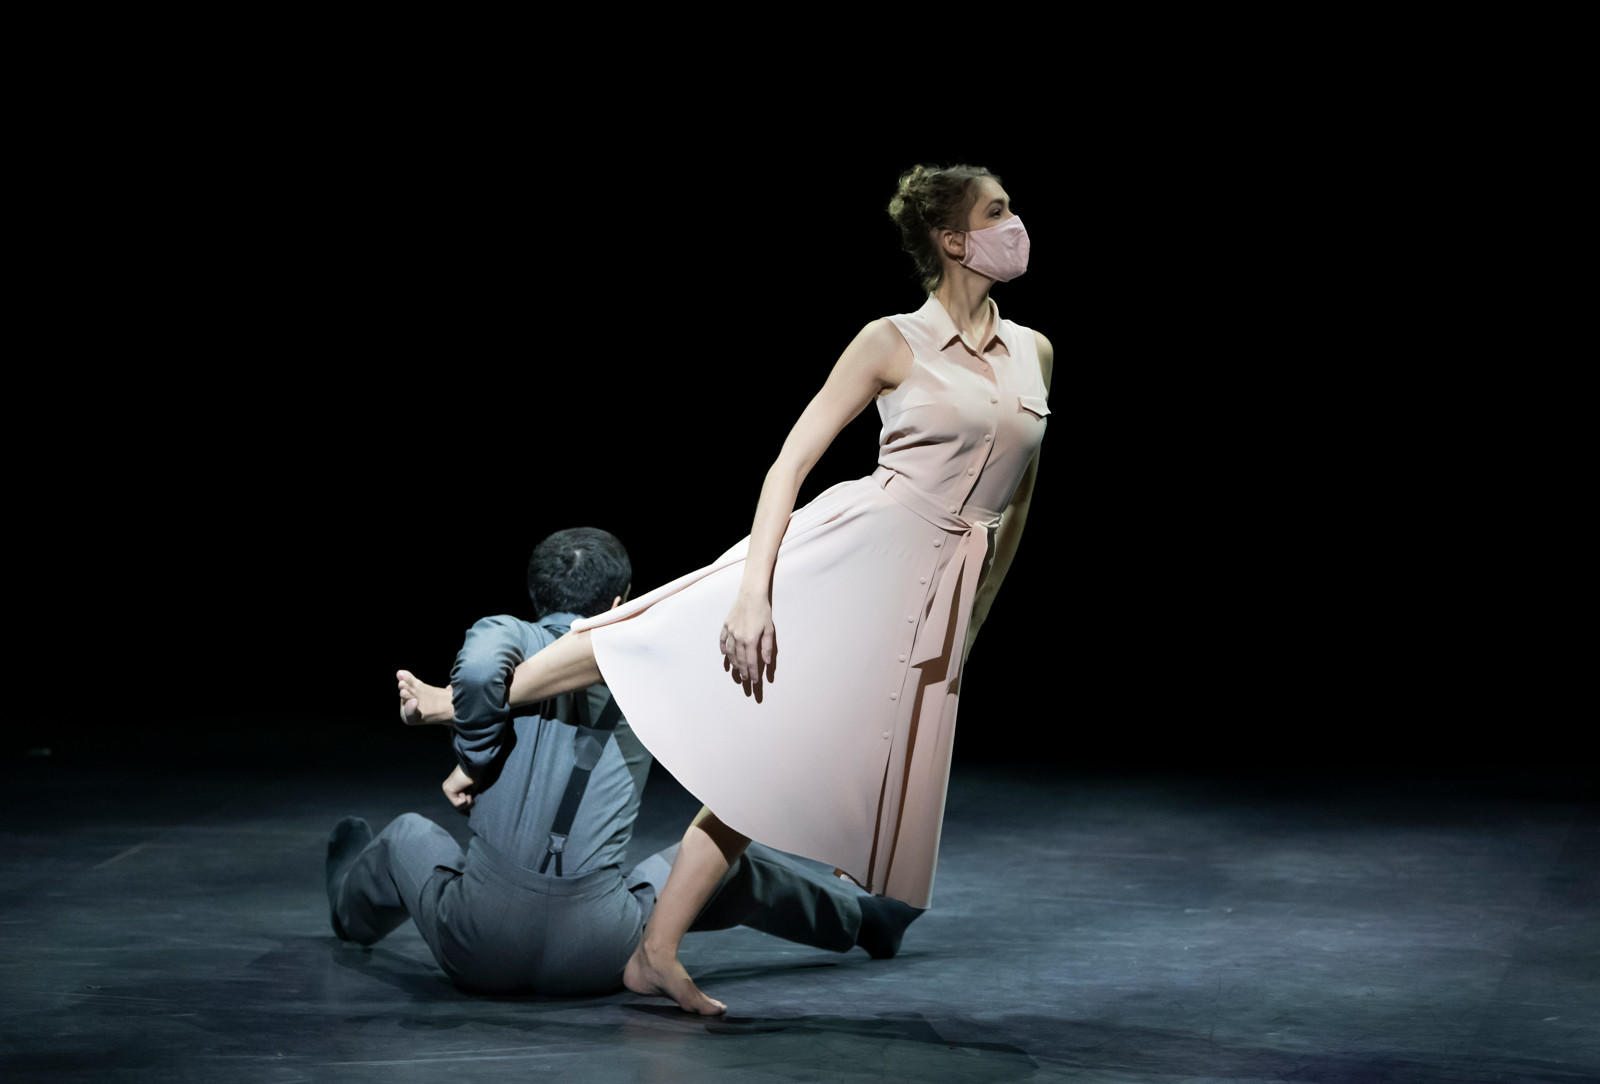 1ulien_Benhamou___Opera_national_de_Paris-CLOUDS-INSIDE--Tess-Voelker--Marion-Gautier-de-Charnace--Antonin-Monie--c--Julien-Benhamou-OnP--DSC_5040---1600px.JPG